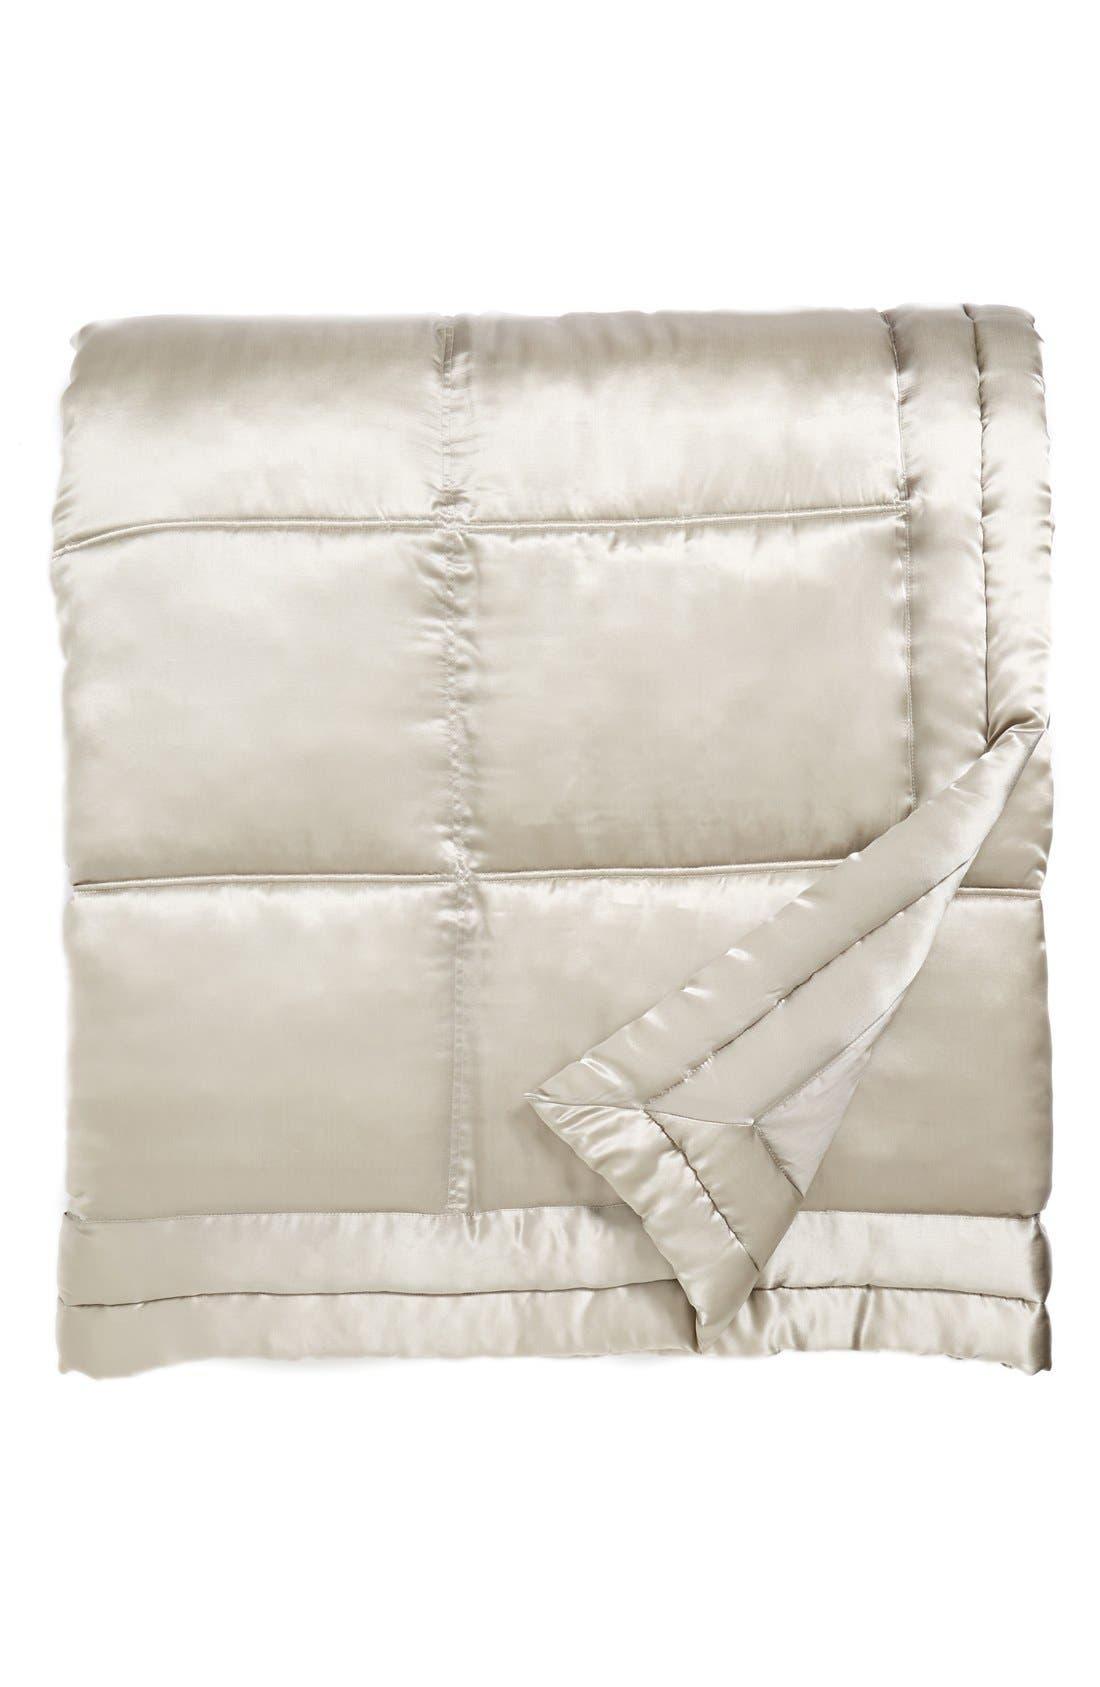 Donna Karan Collection 'Reflection' Silk Charmeuse Quilt,                         Main,                         color, Silver